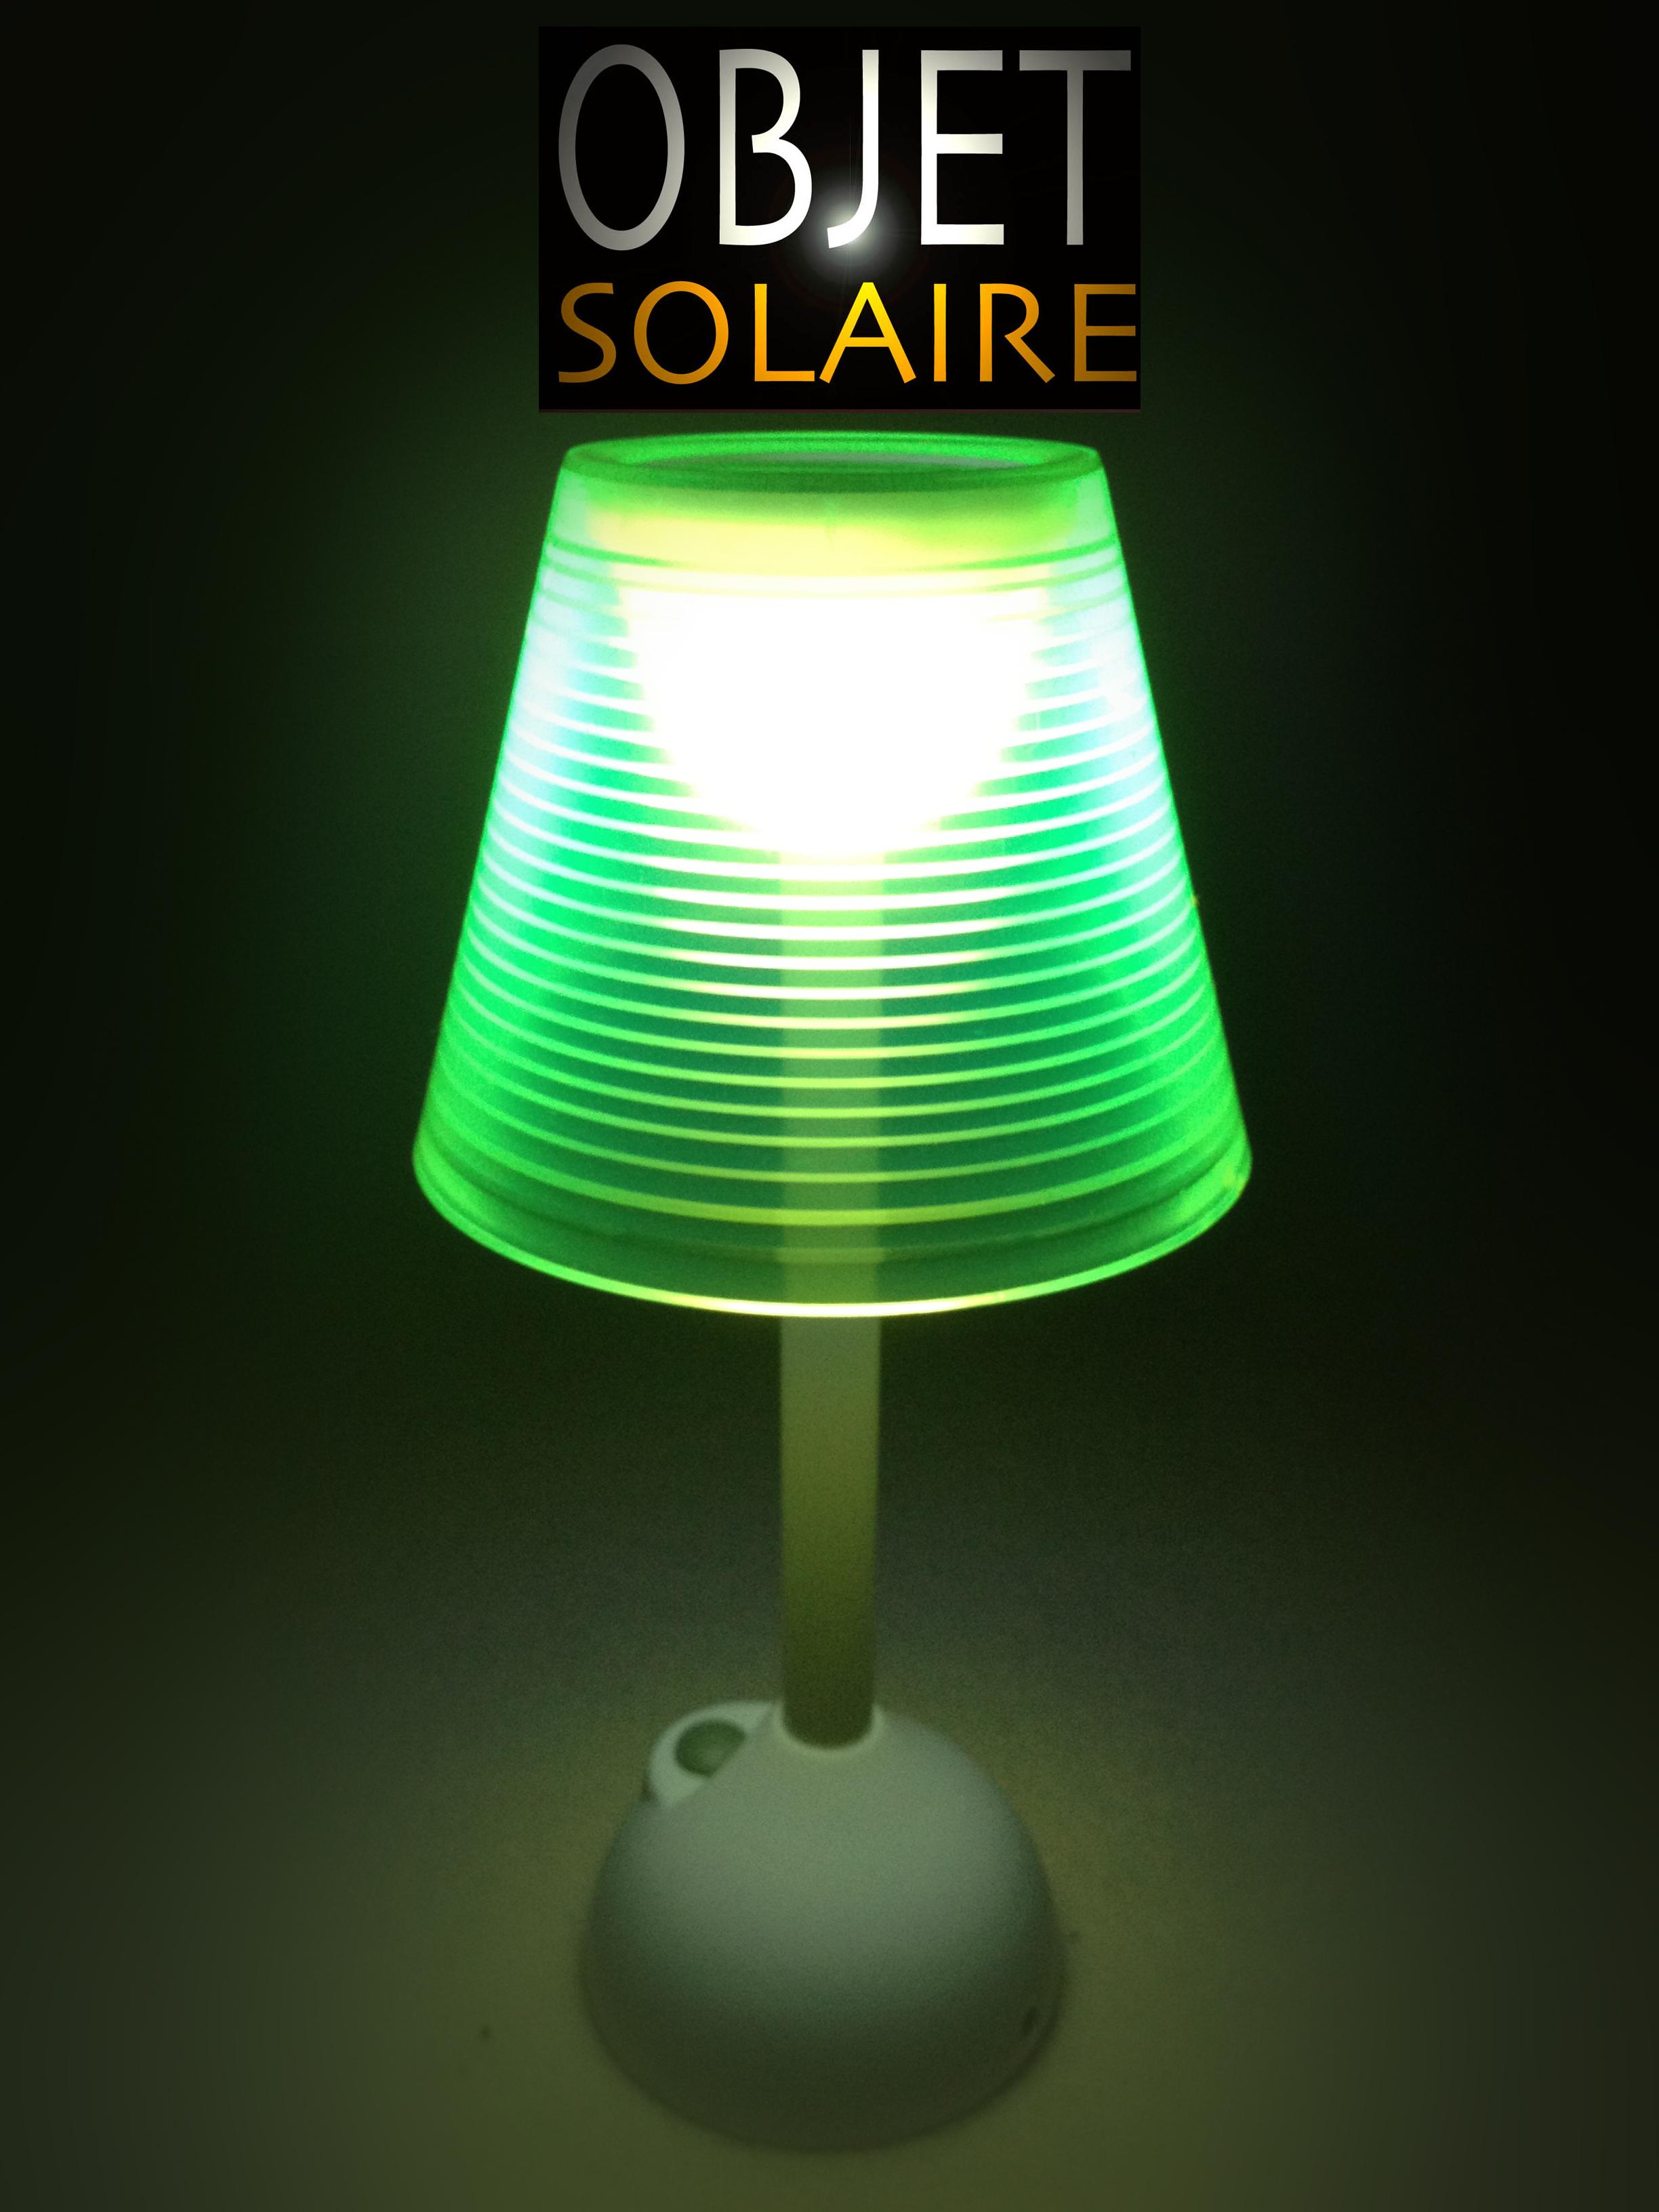 lampe solaire et usb lampes solaires decoratives table objetsolaire. Black Bedroom Furniture Sets. Home Design Ideas